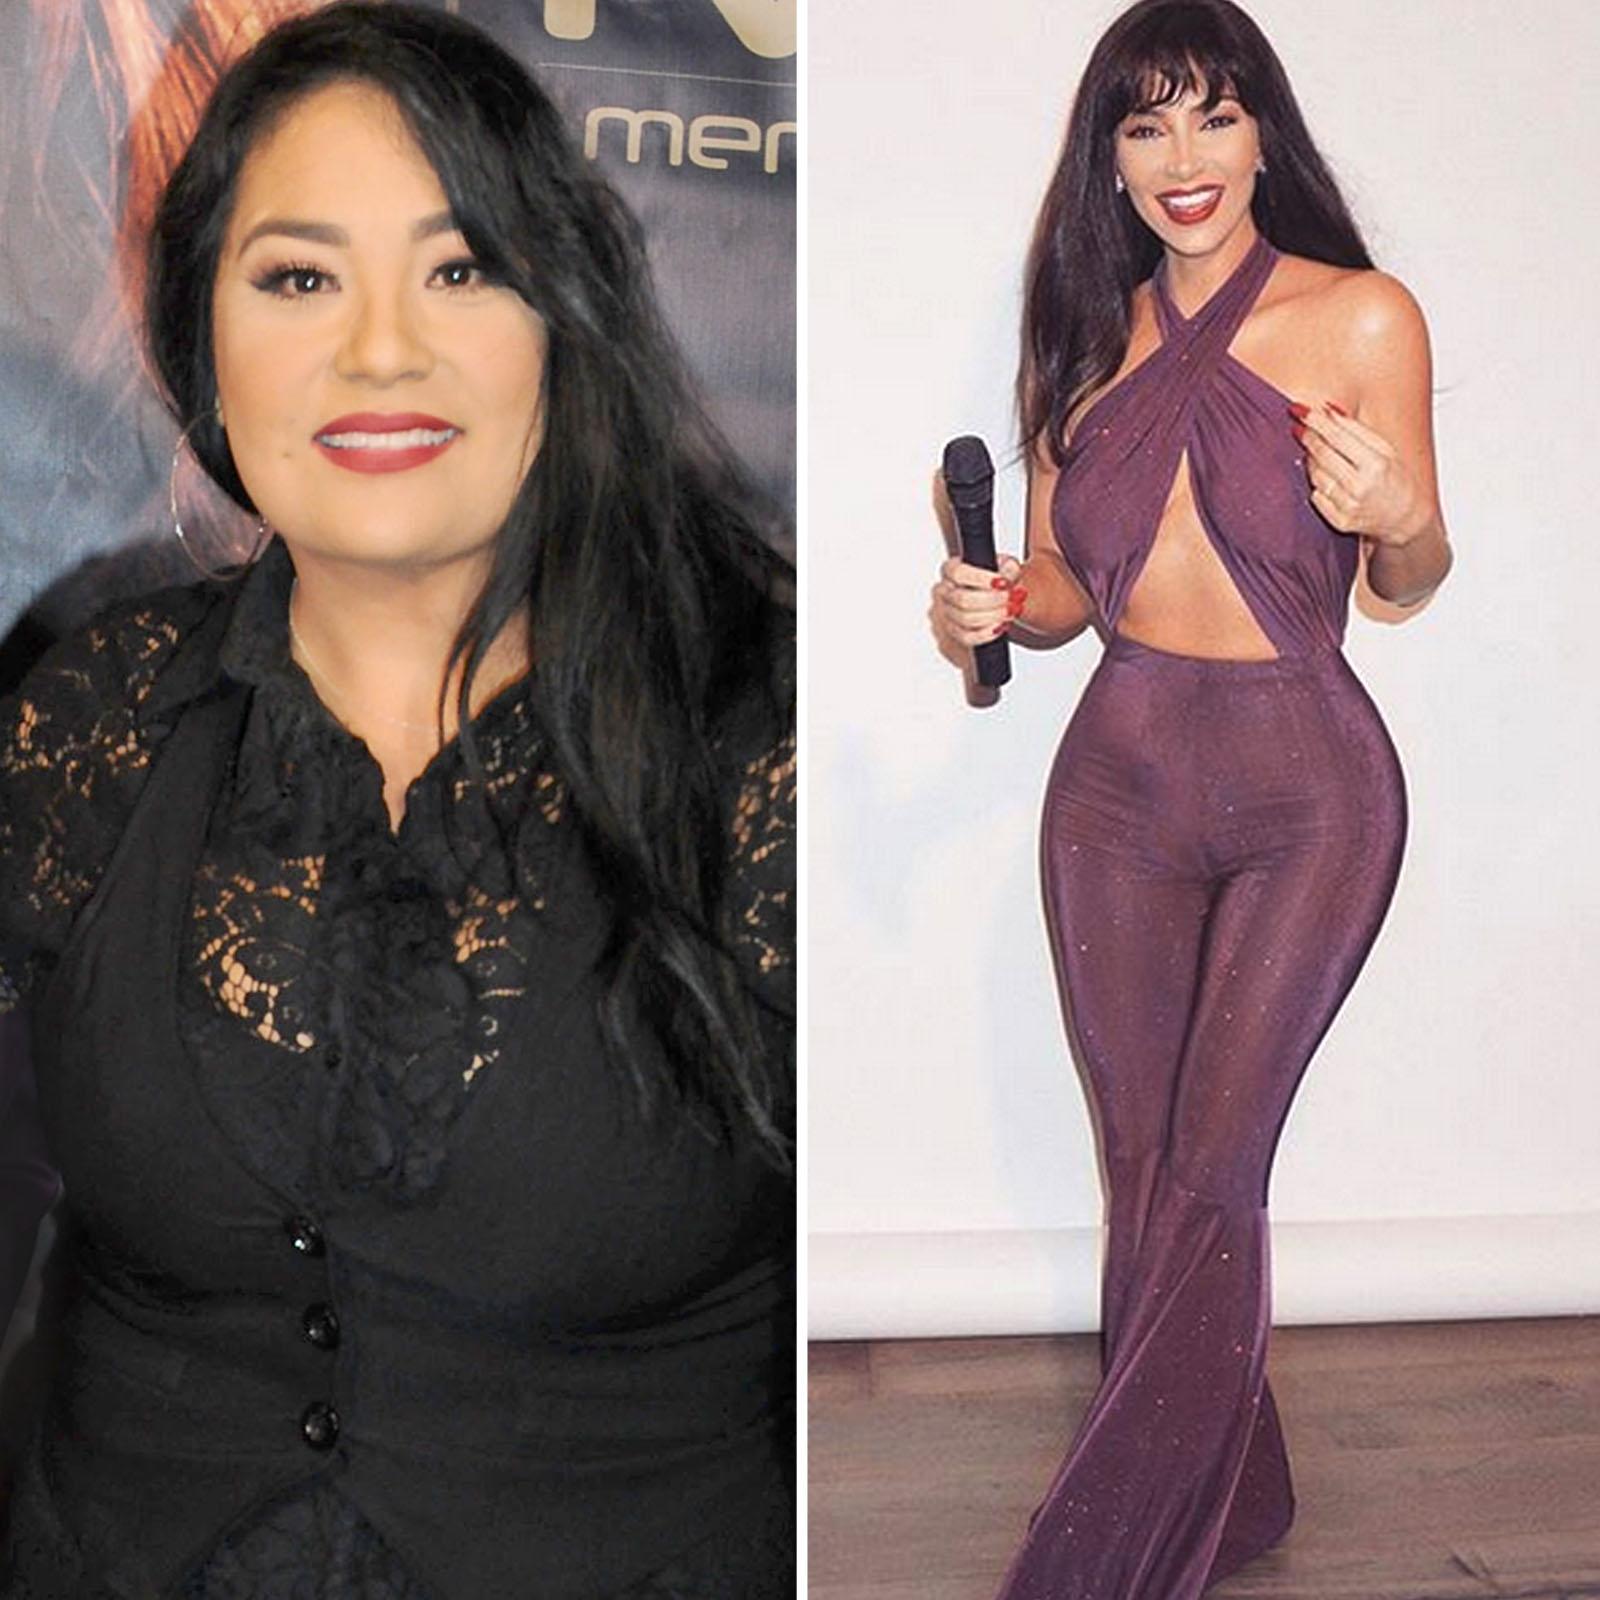 Suzette Quintanilla y Kim Kardashian